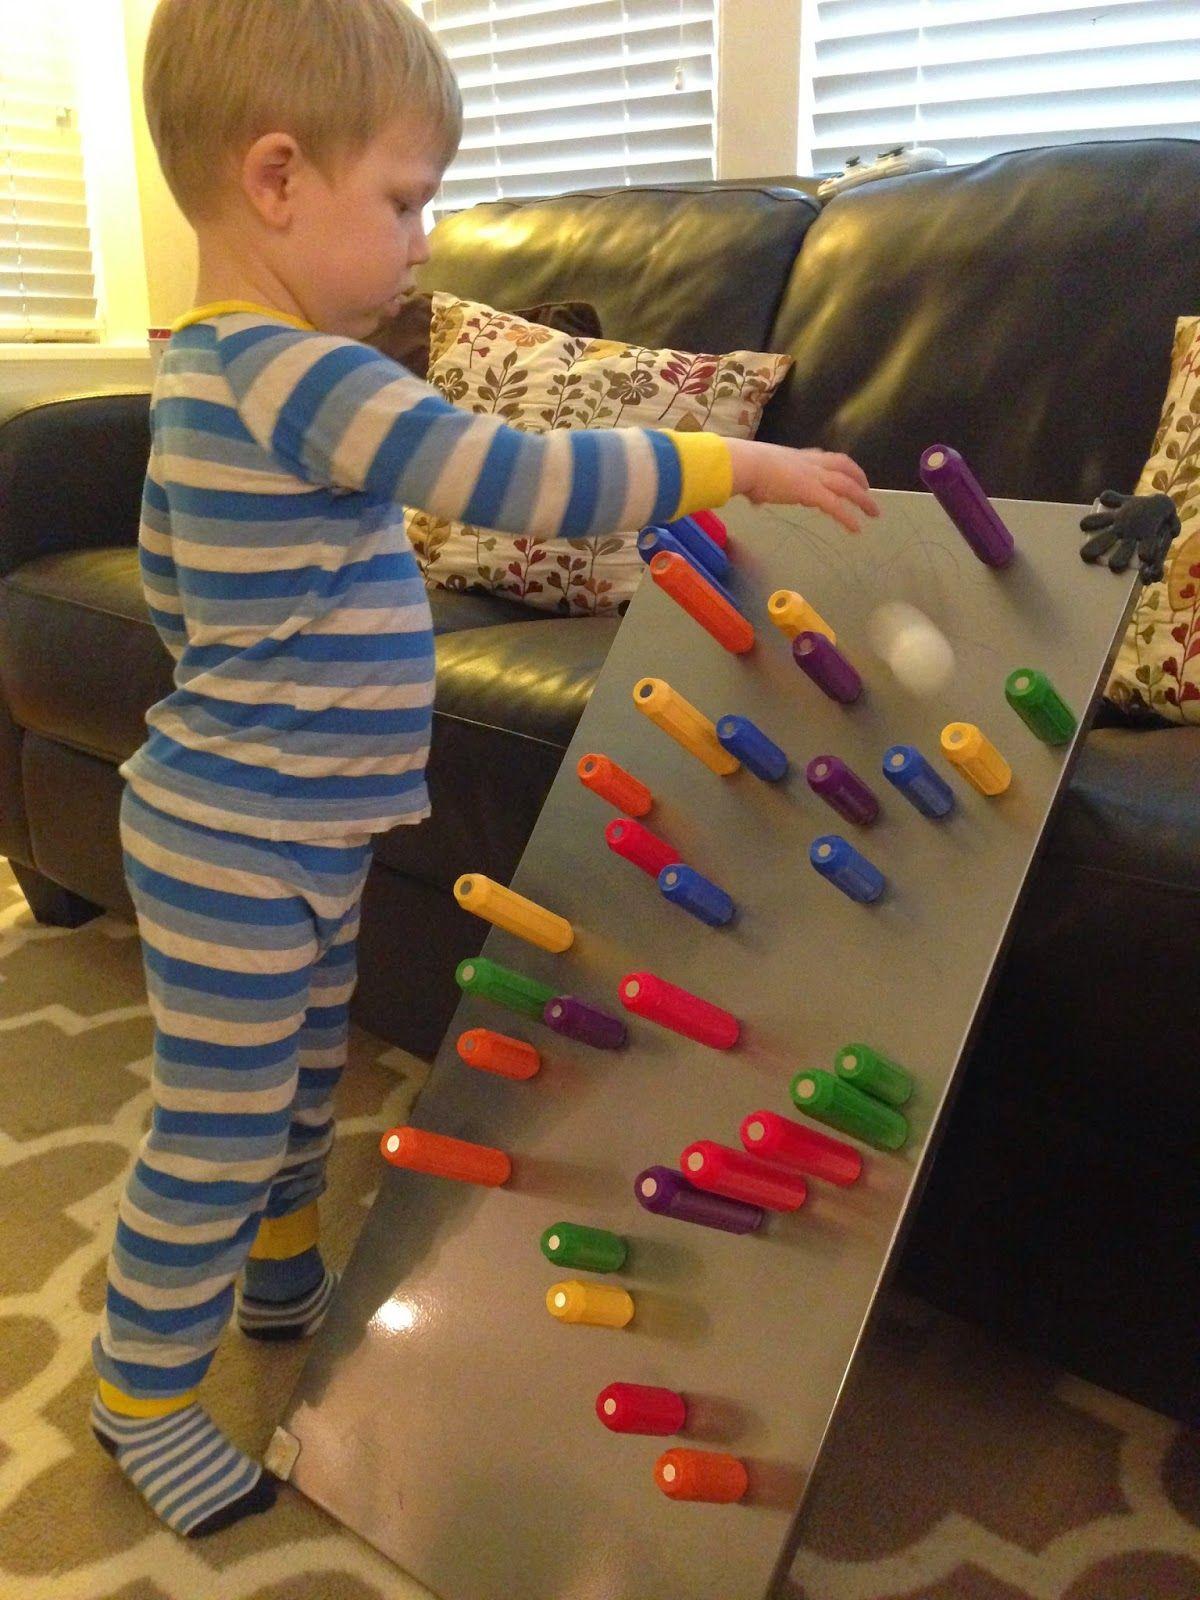 magnet wood gears - Google Search | Preschool Indoor Ideas ...